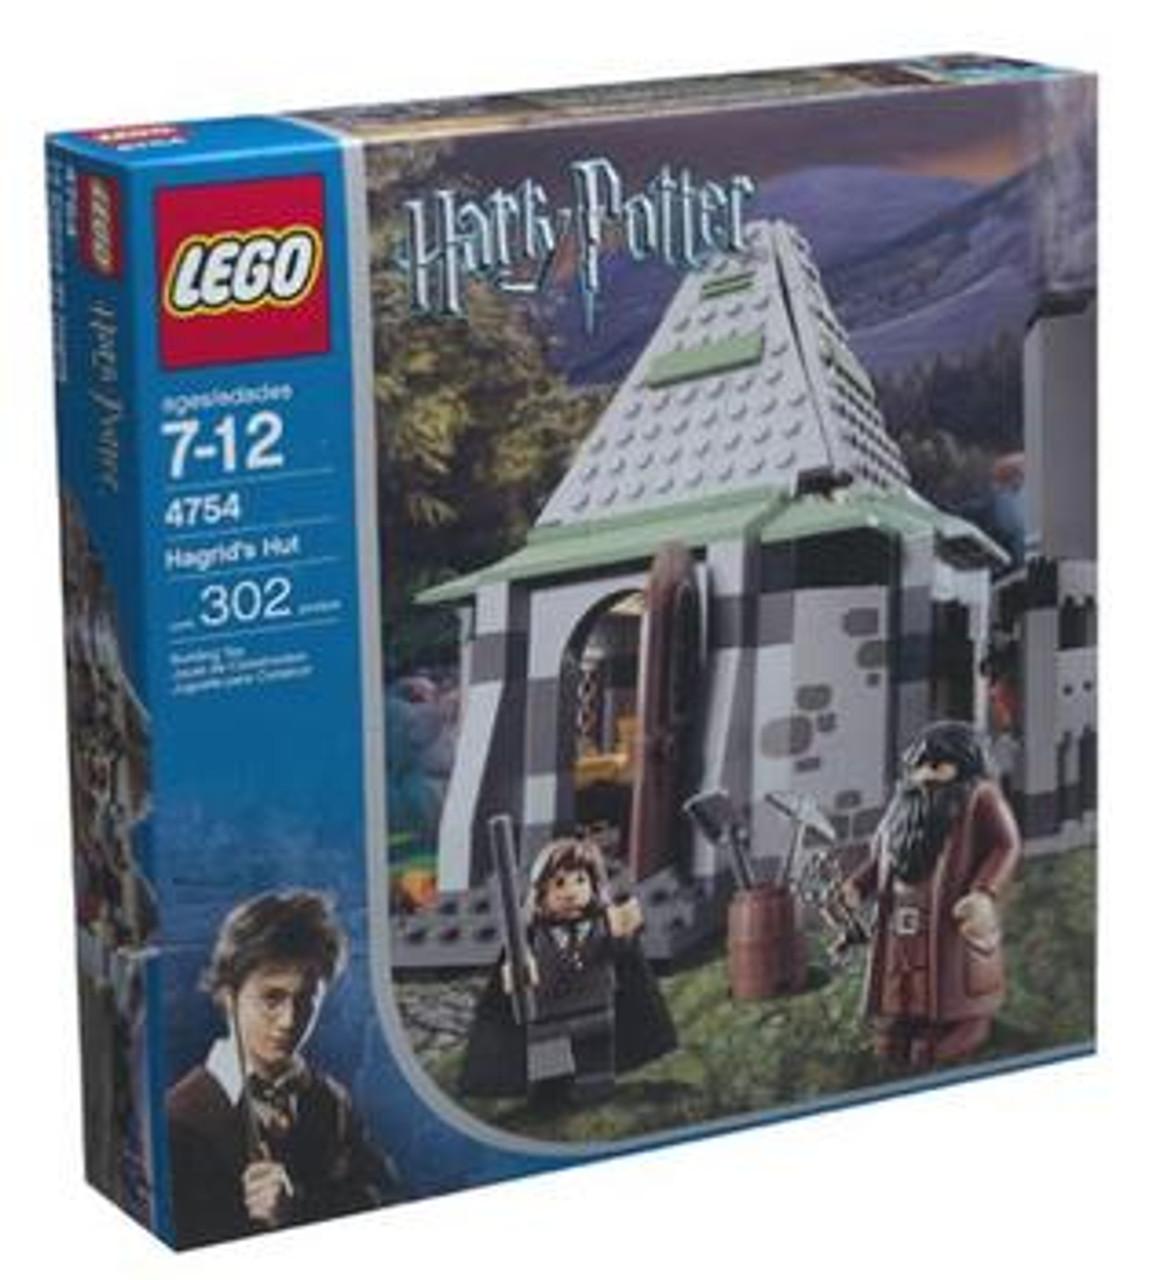 LEGO Harry Potter Prisoner of Azkaban Hagrid's Hut Set #4754